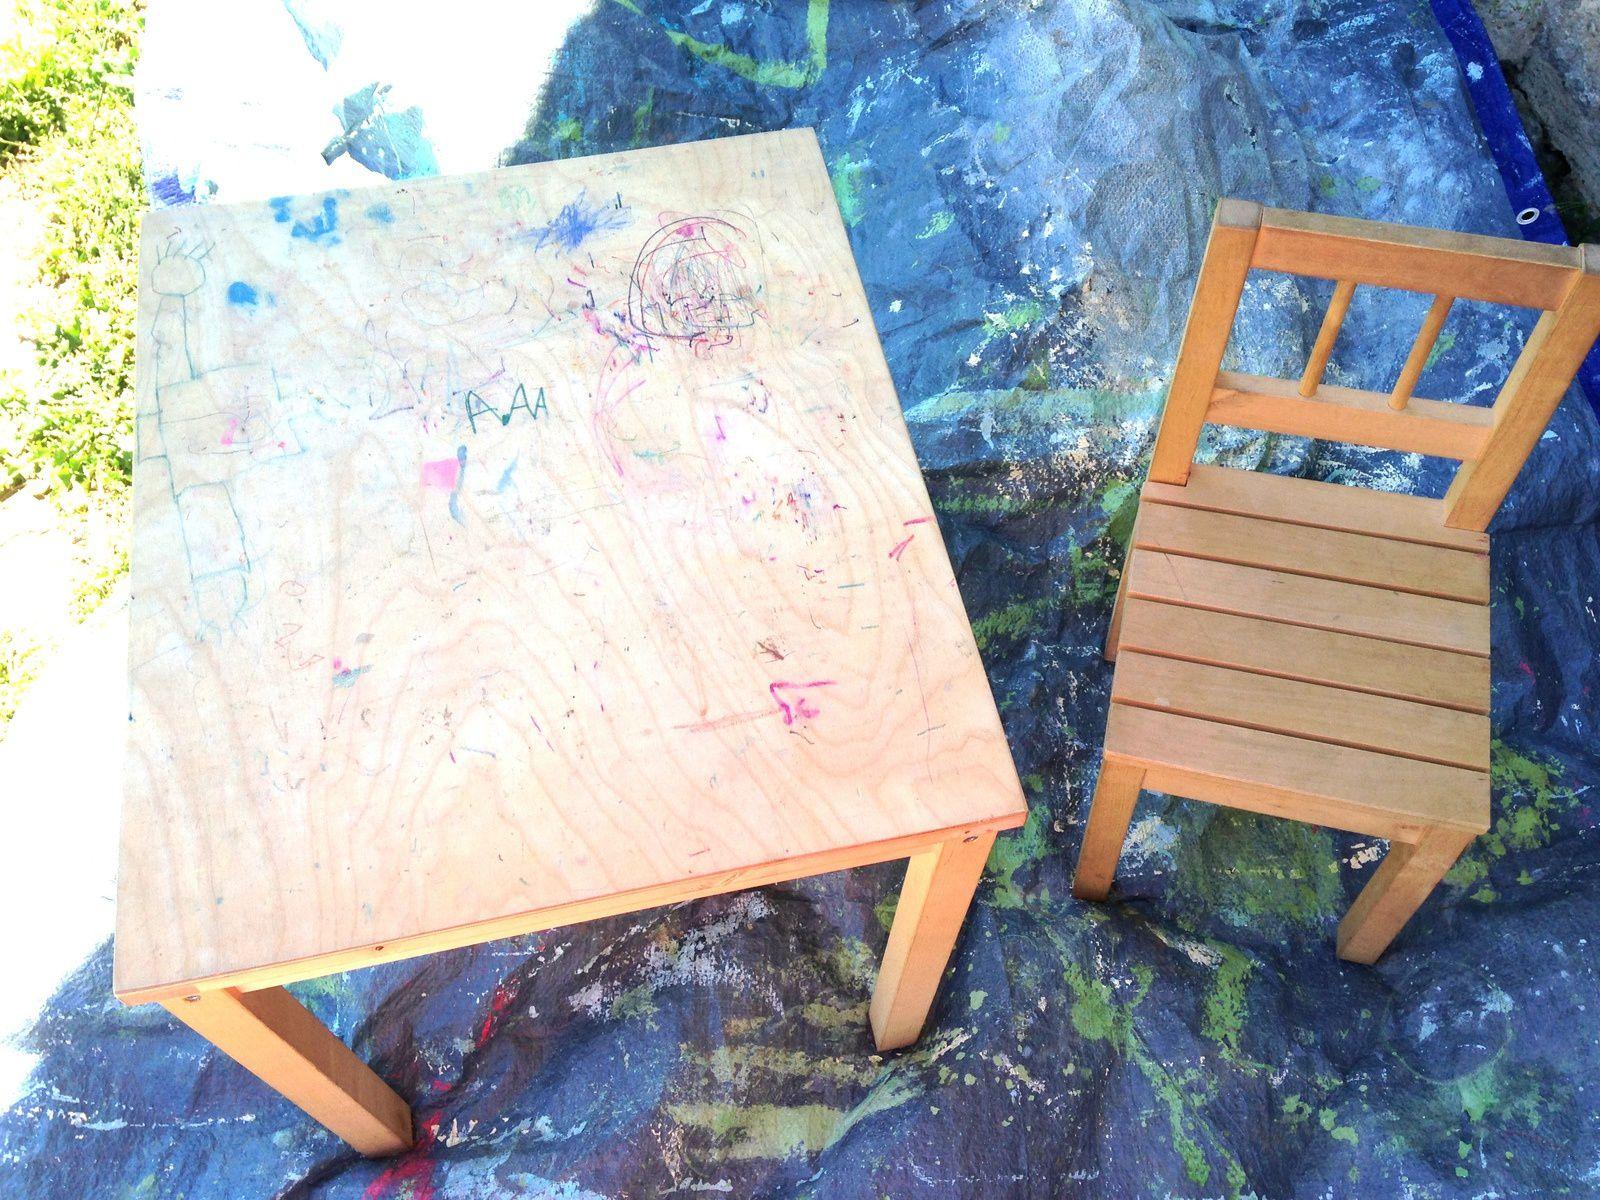 table et chaise d 39 enfant repeintes charlotteblabla. Black Bedroom Furniture Sets. Home Design Ideas